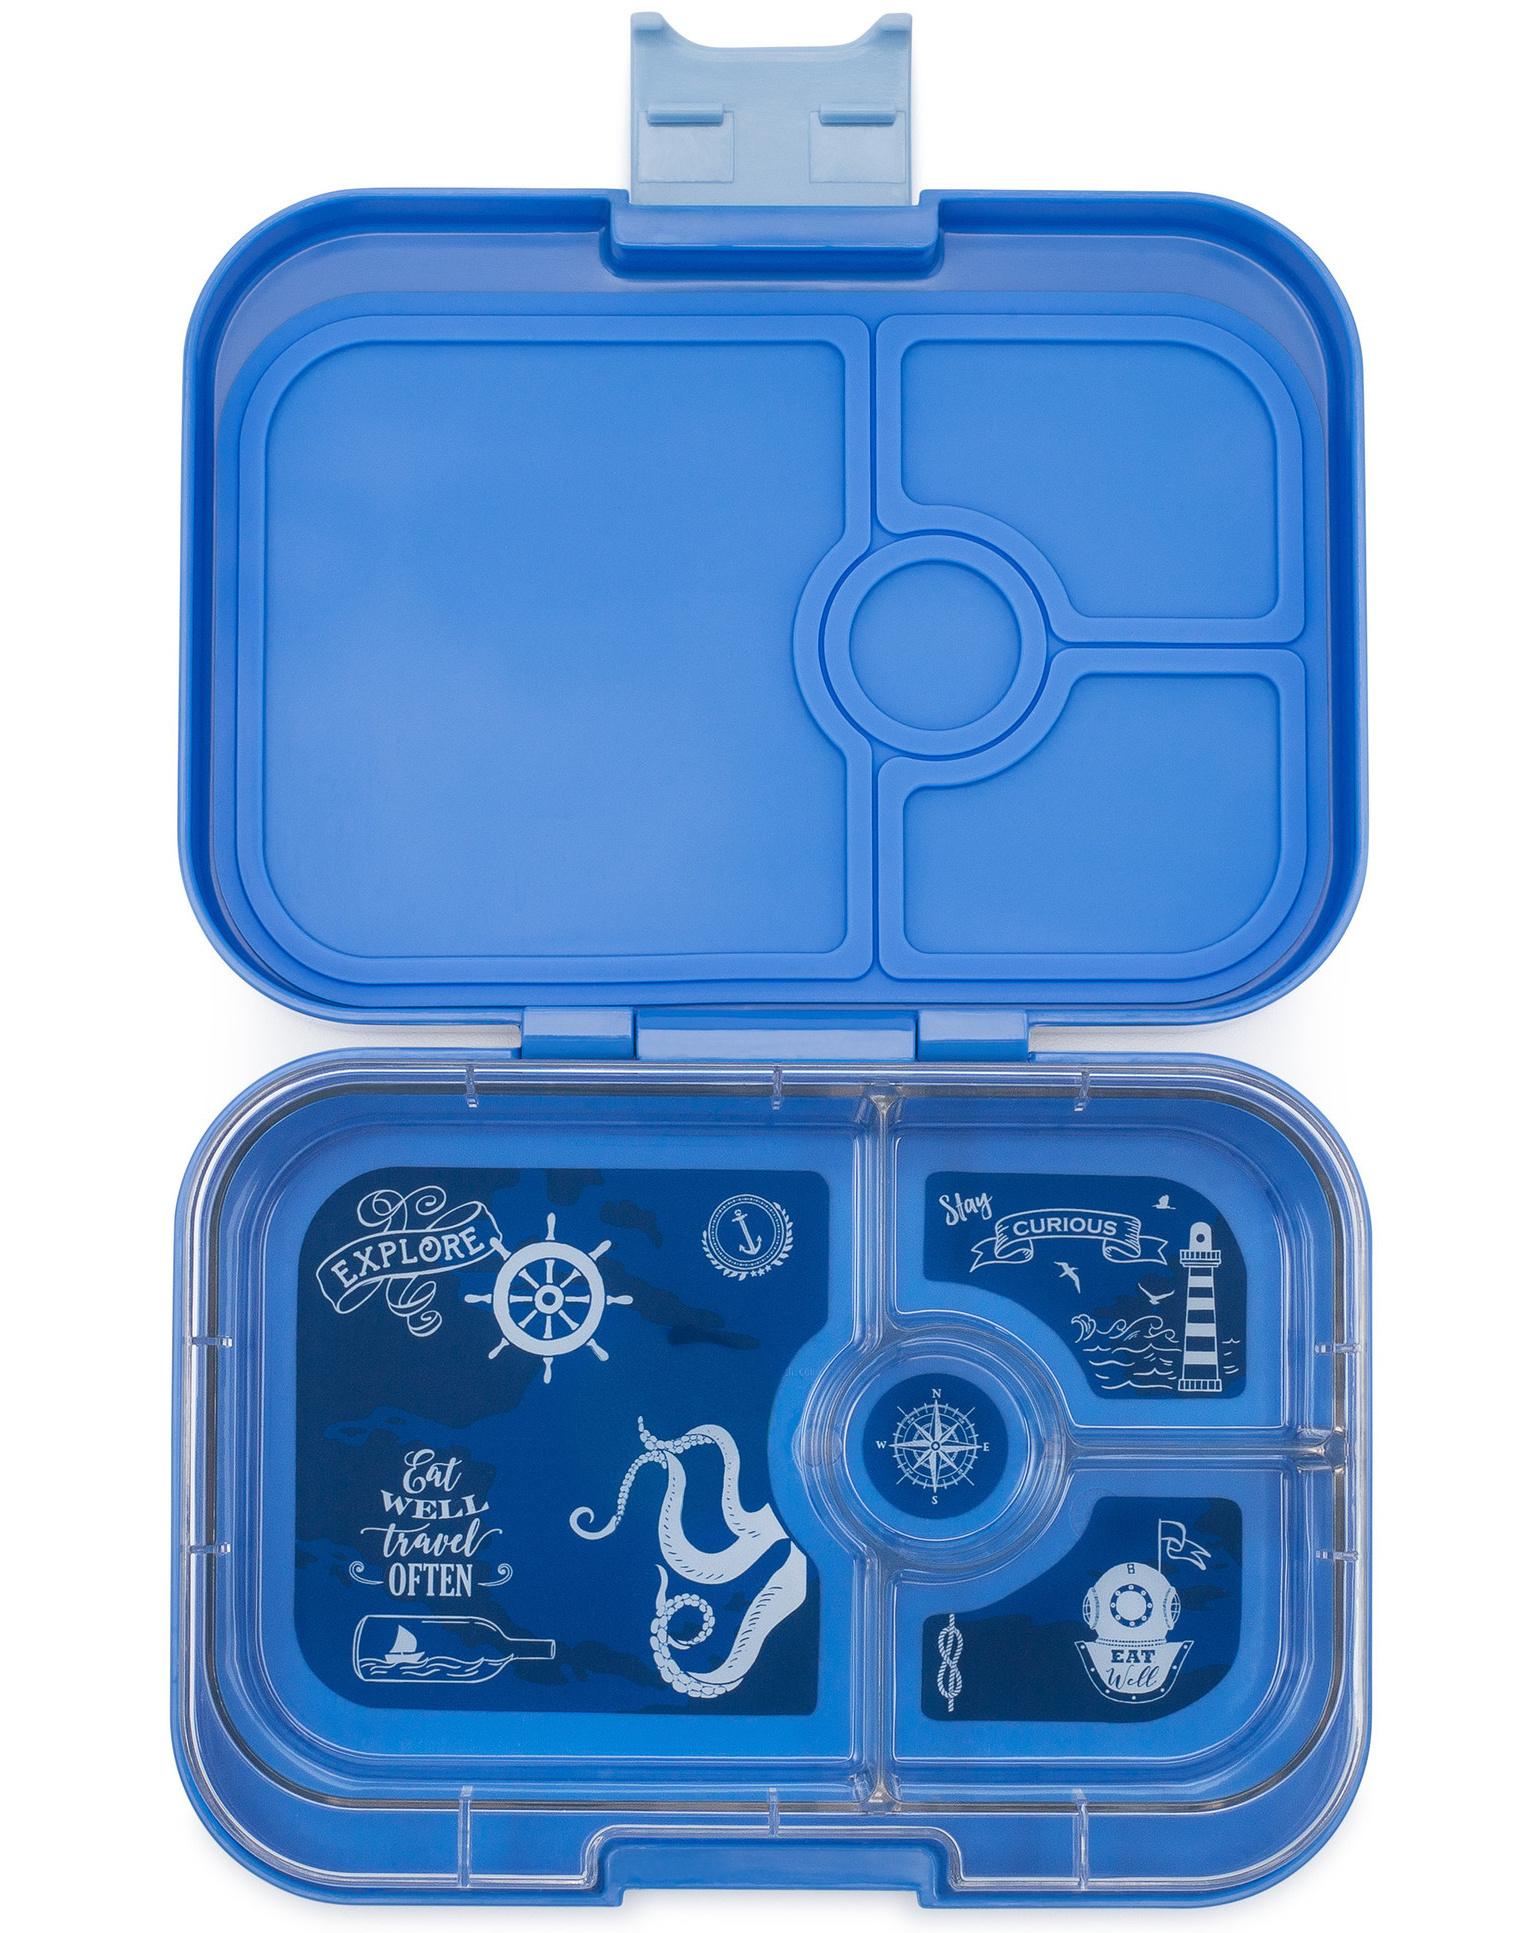 Yumbox Panino 4-sections Jodphur blue / Explore tray-1